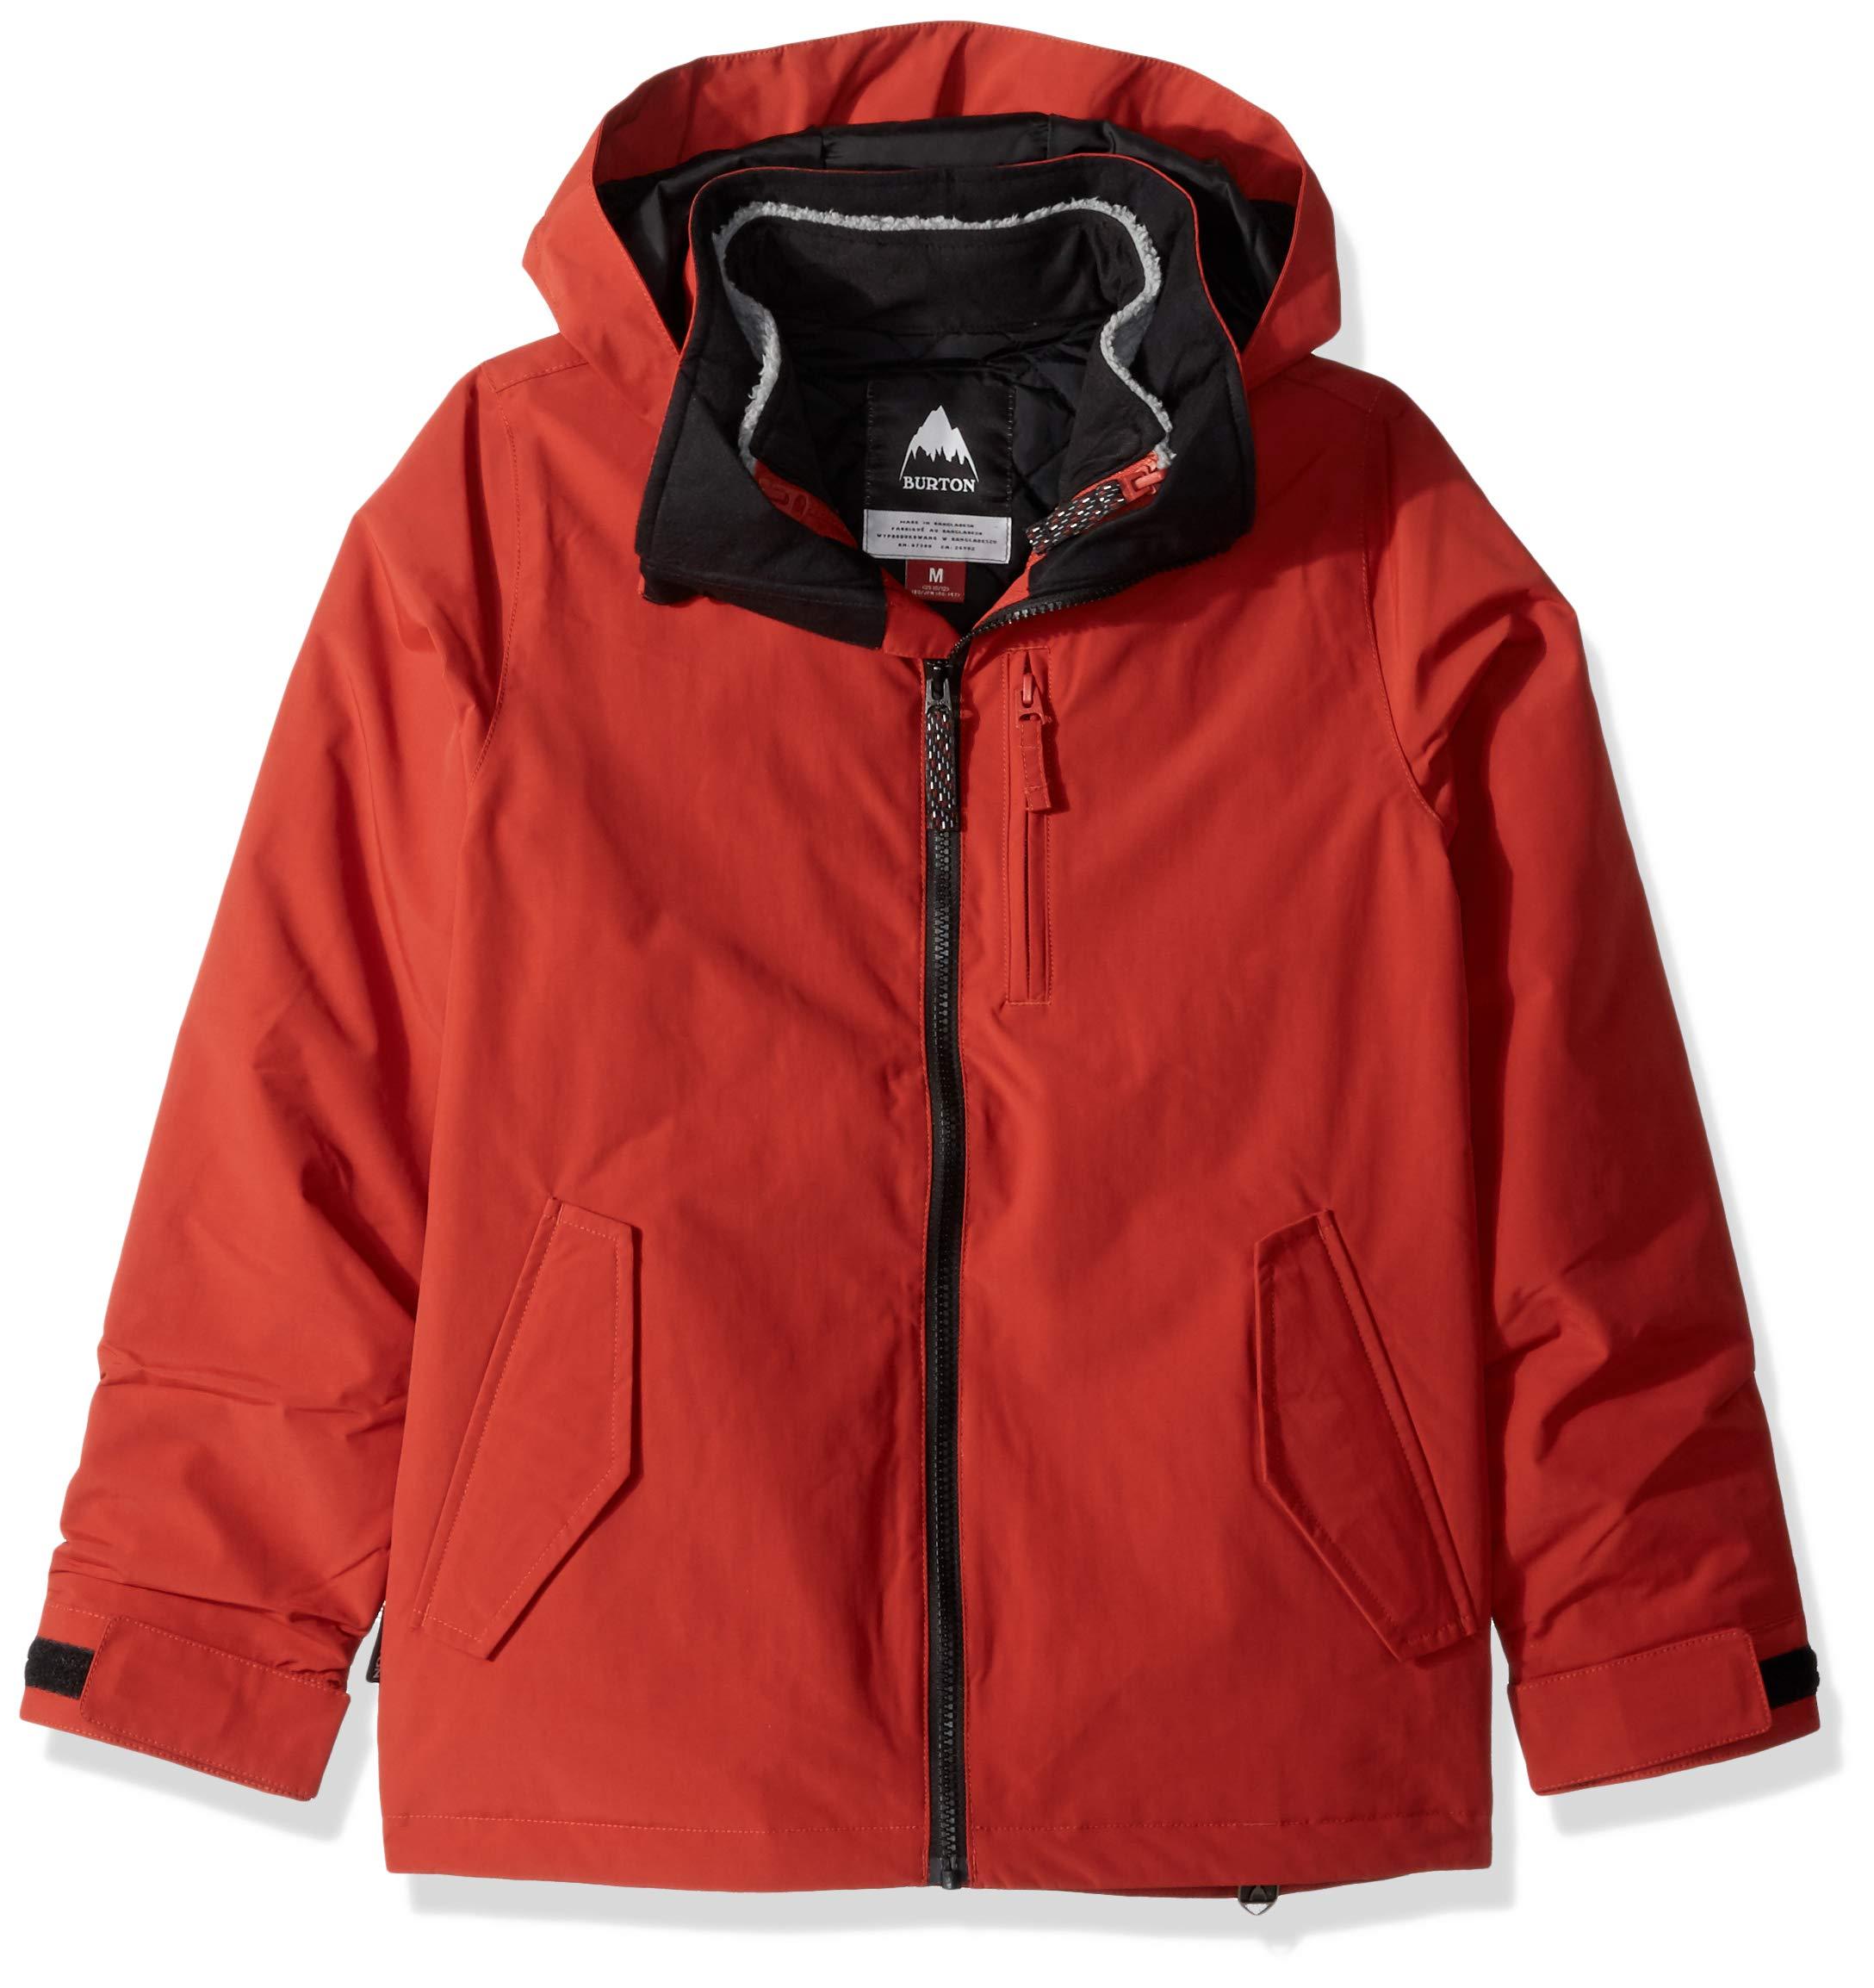 Burton Boys Link System Jacket with Removable Fleece Liner